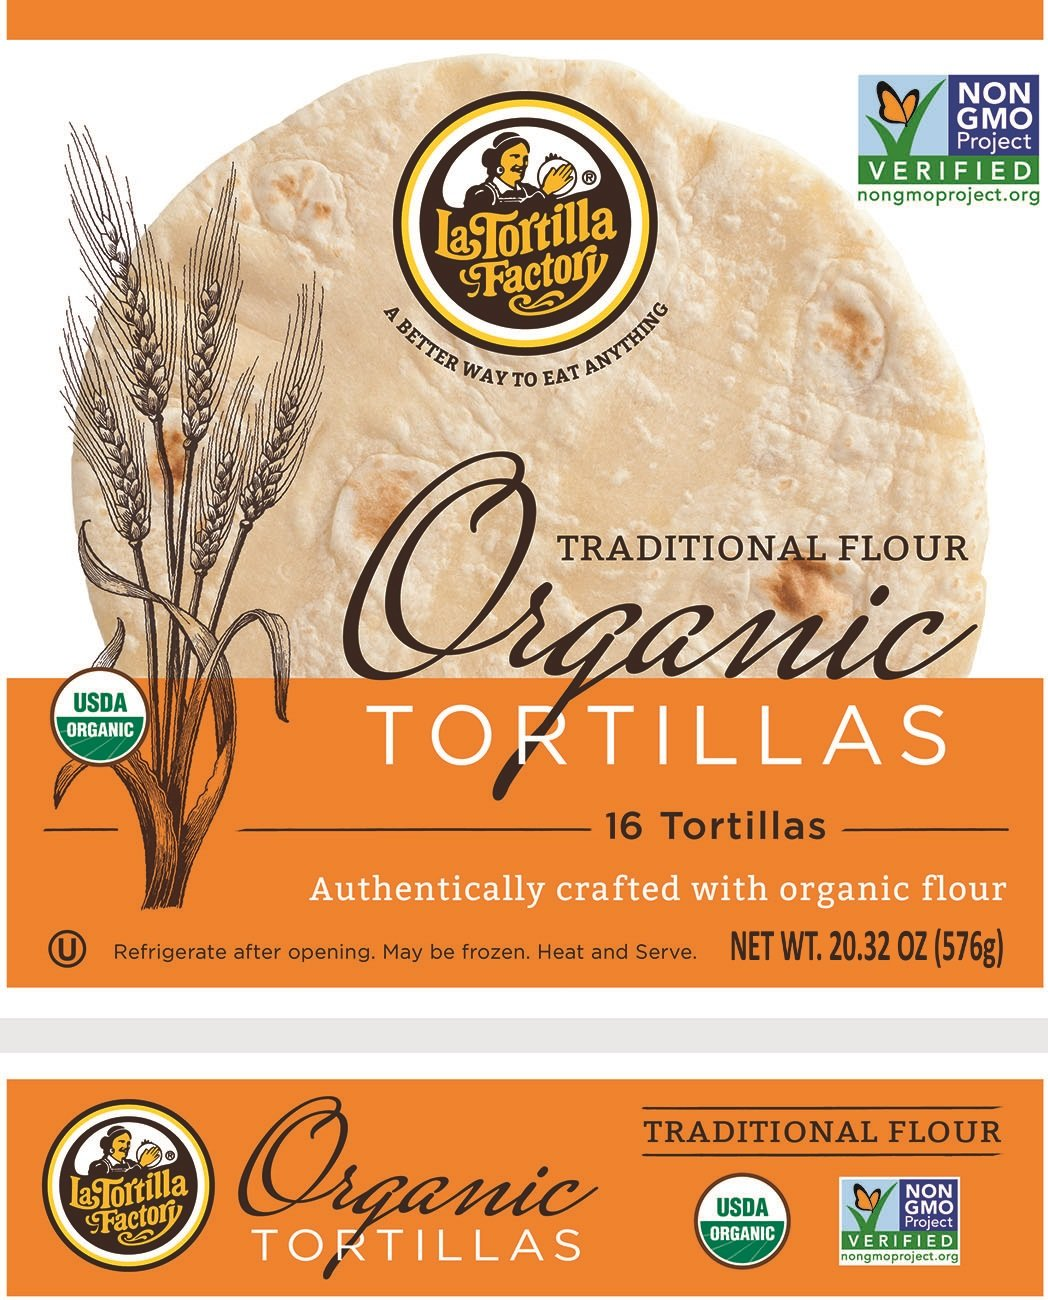 La Tortilla Factory Corn Yellow, 8.46 oz, 8 ct: Amazon.com